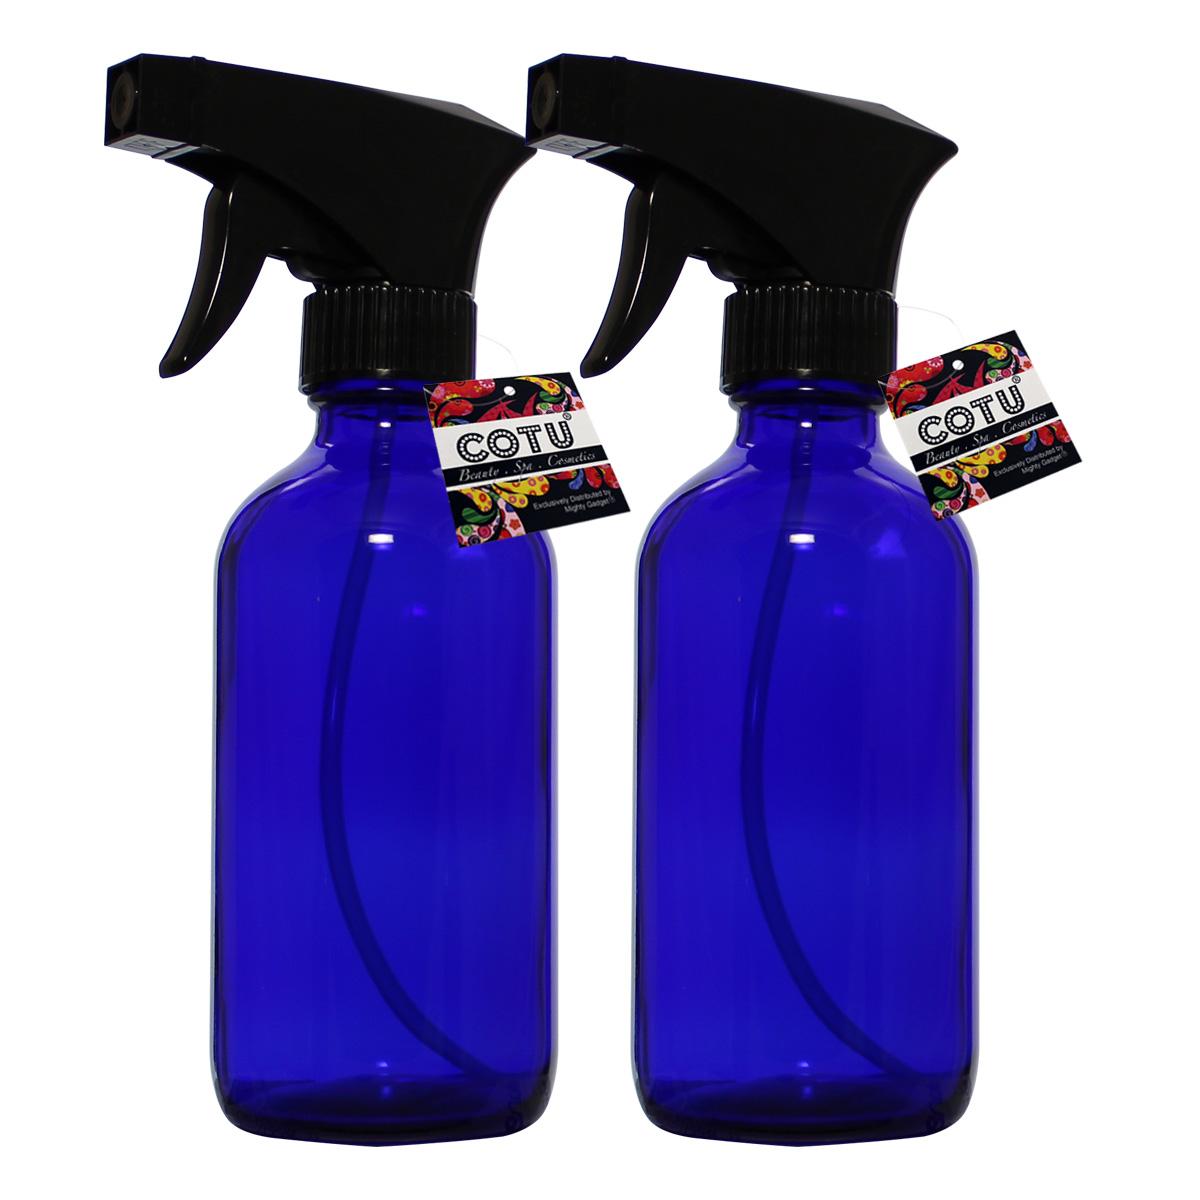 2 x 8oz Cobalt Blue Glass Bottle w Trigger Spray 1